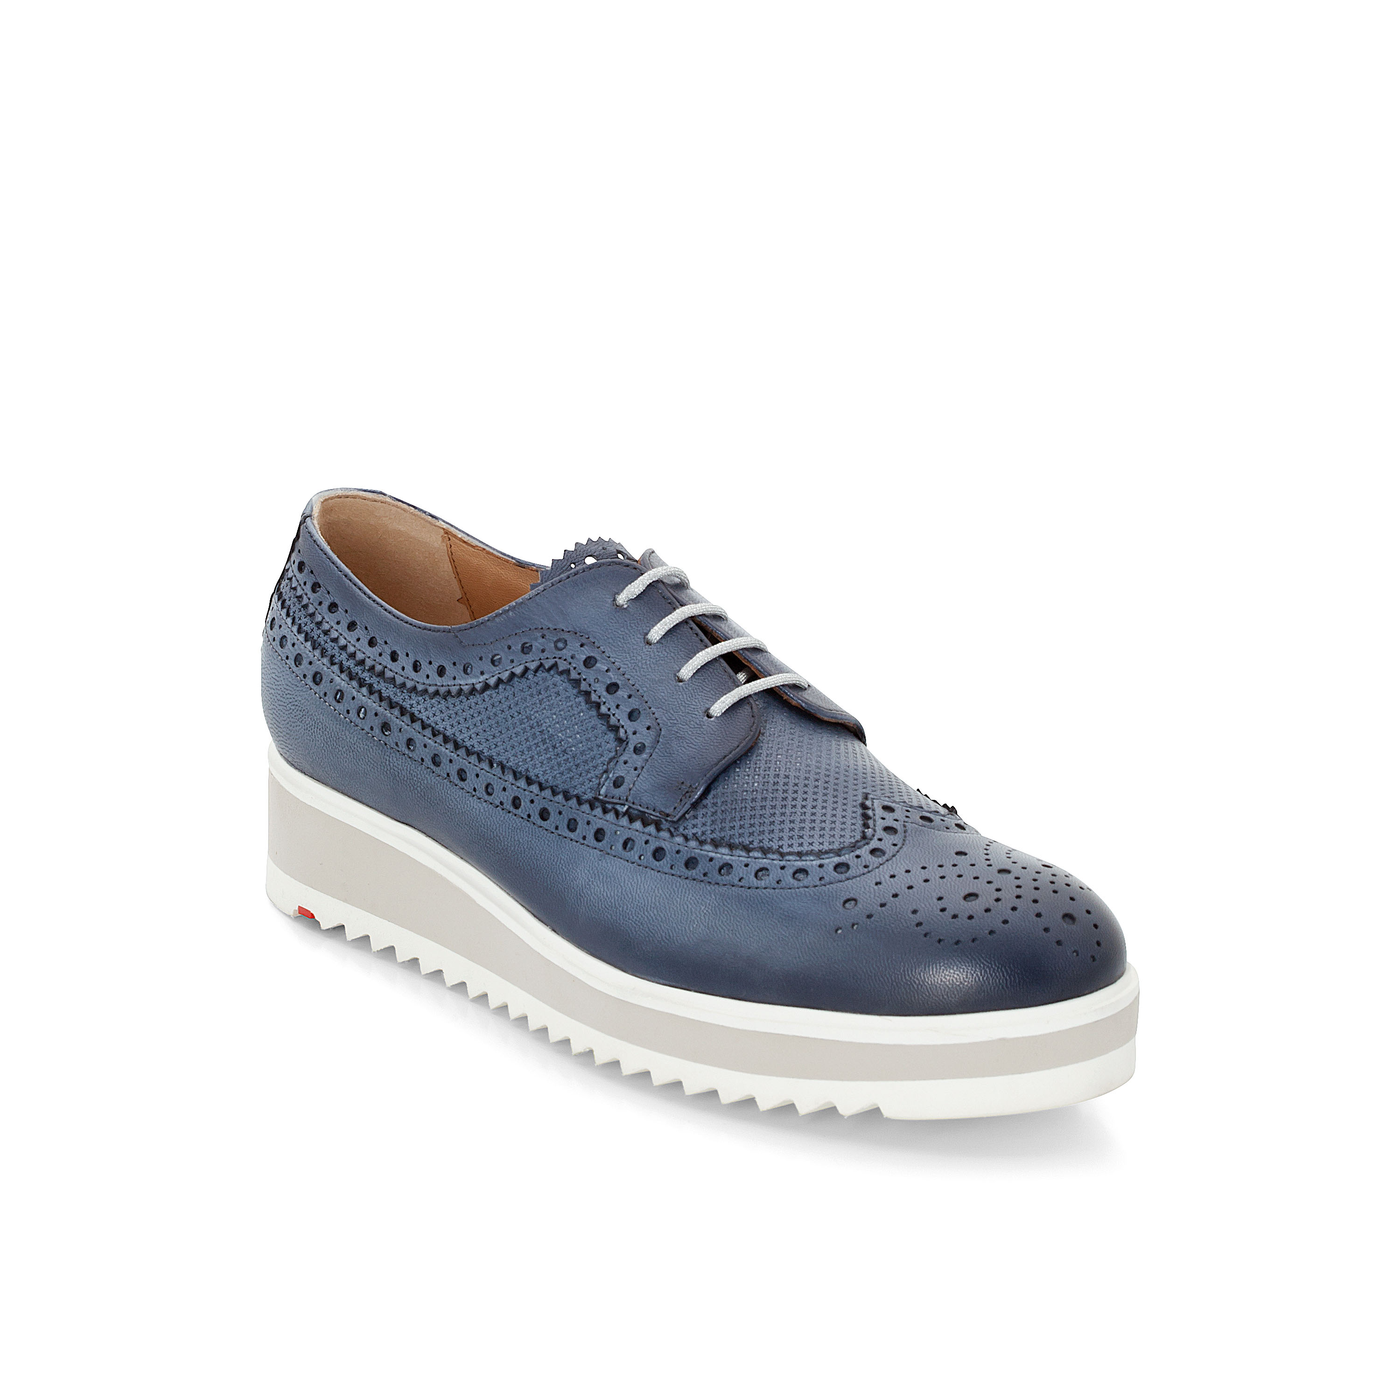 Schnürschuhe | Schuhe > Schnürschuhe | Lloyd